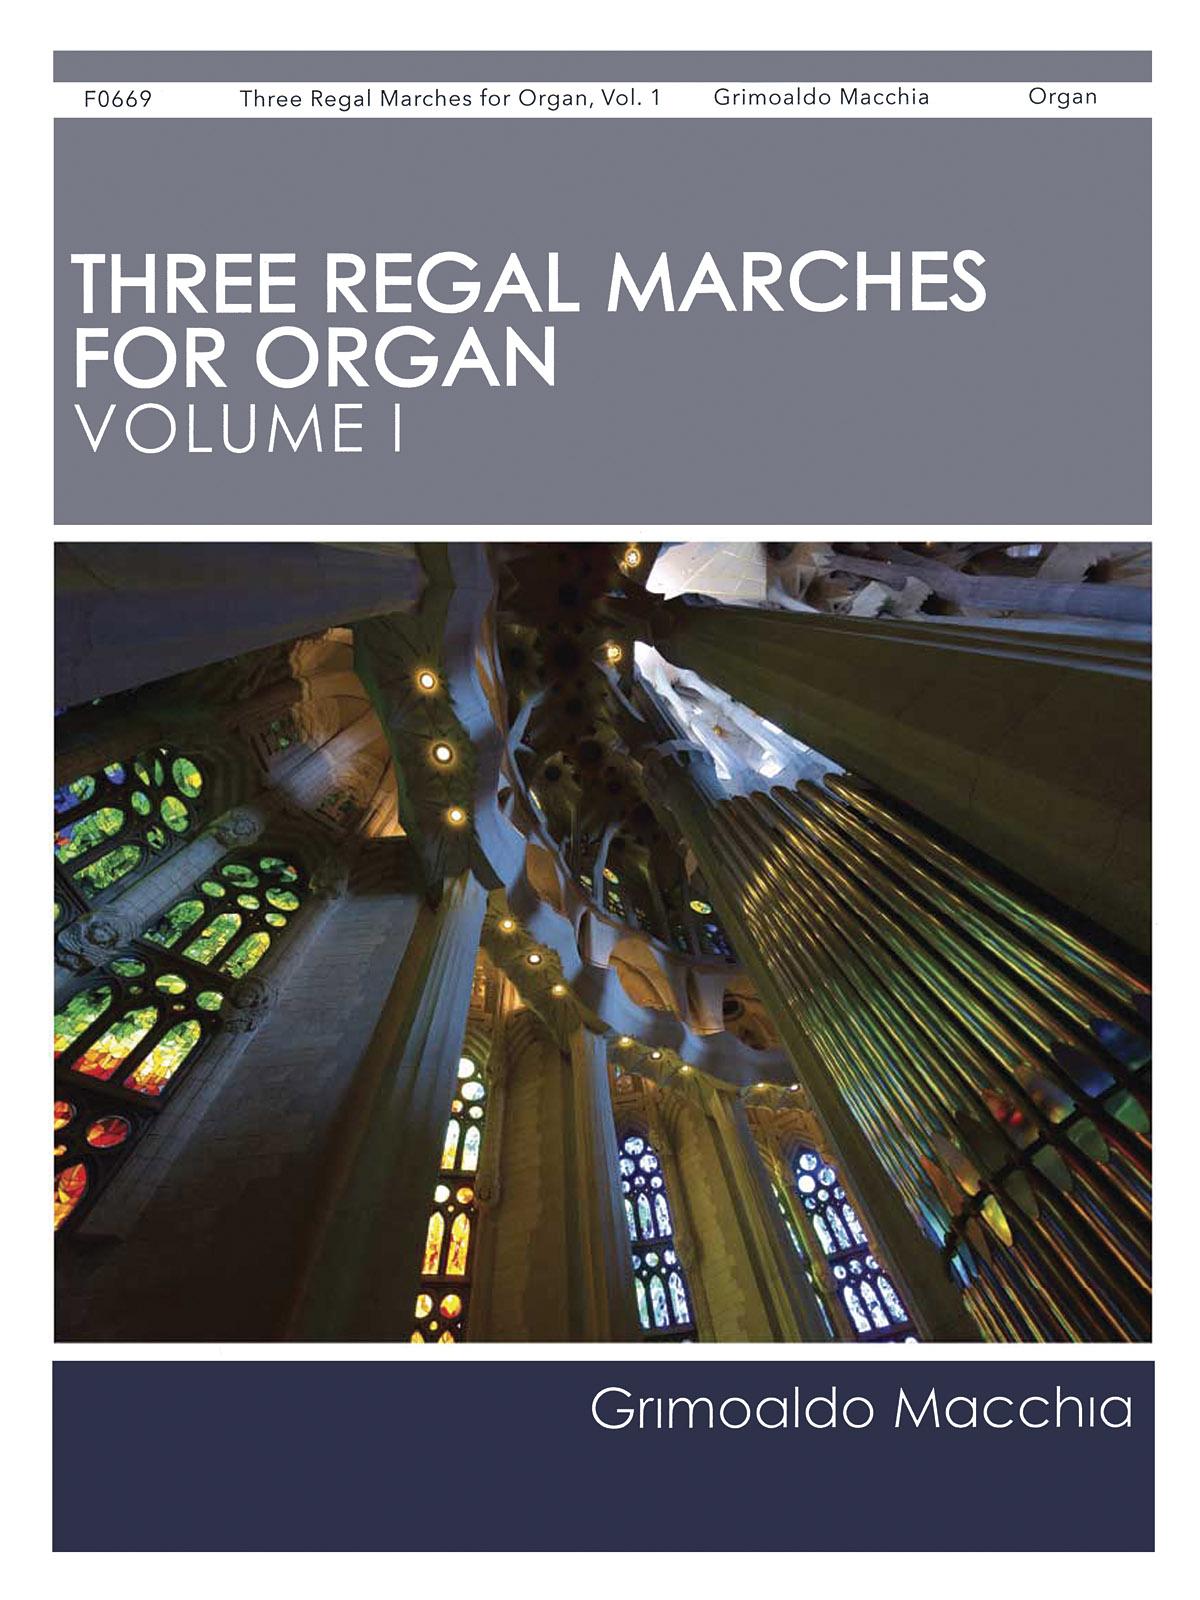 Grimoaldo Macchia: Three Regal Marches for Organ Vol. 1: Organ: Instrumental